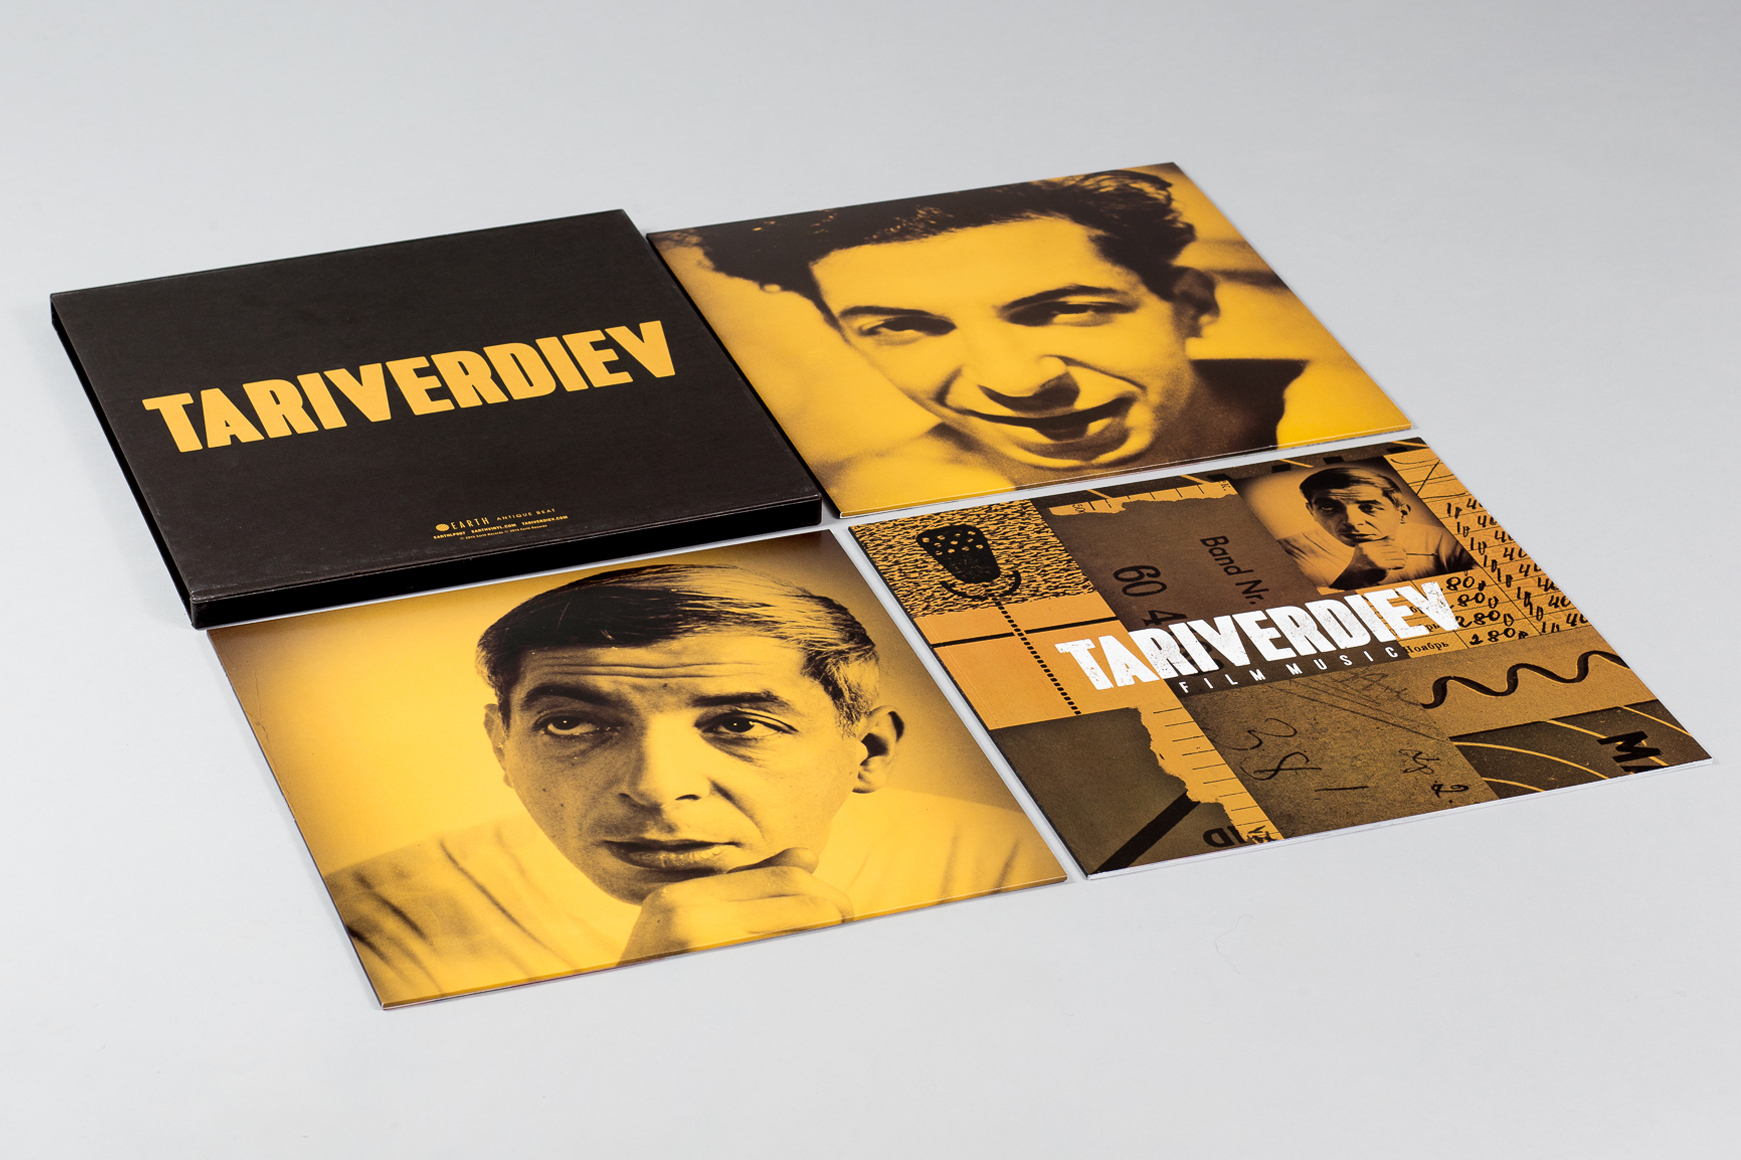 ©-The-Vinyl-Factory-Tariverdiev-Vinyl-Release-Photography-Michael-Wilkin_0001_new11-1-of-2.jpg